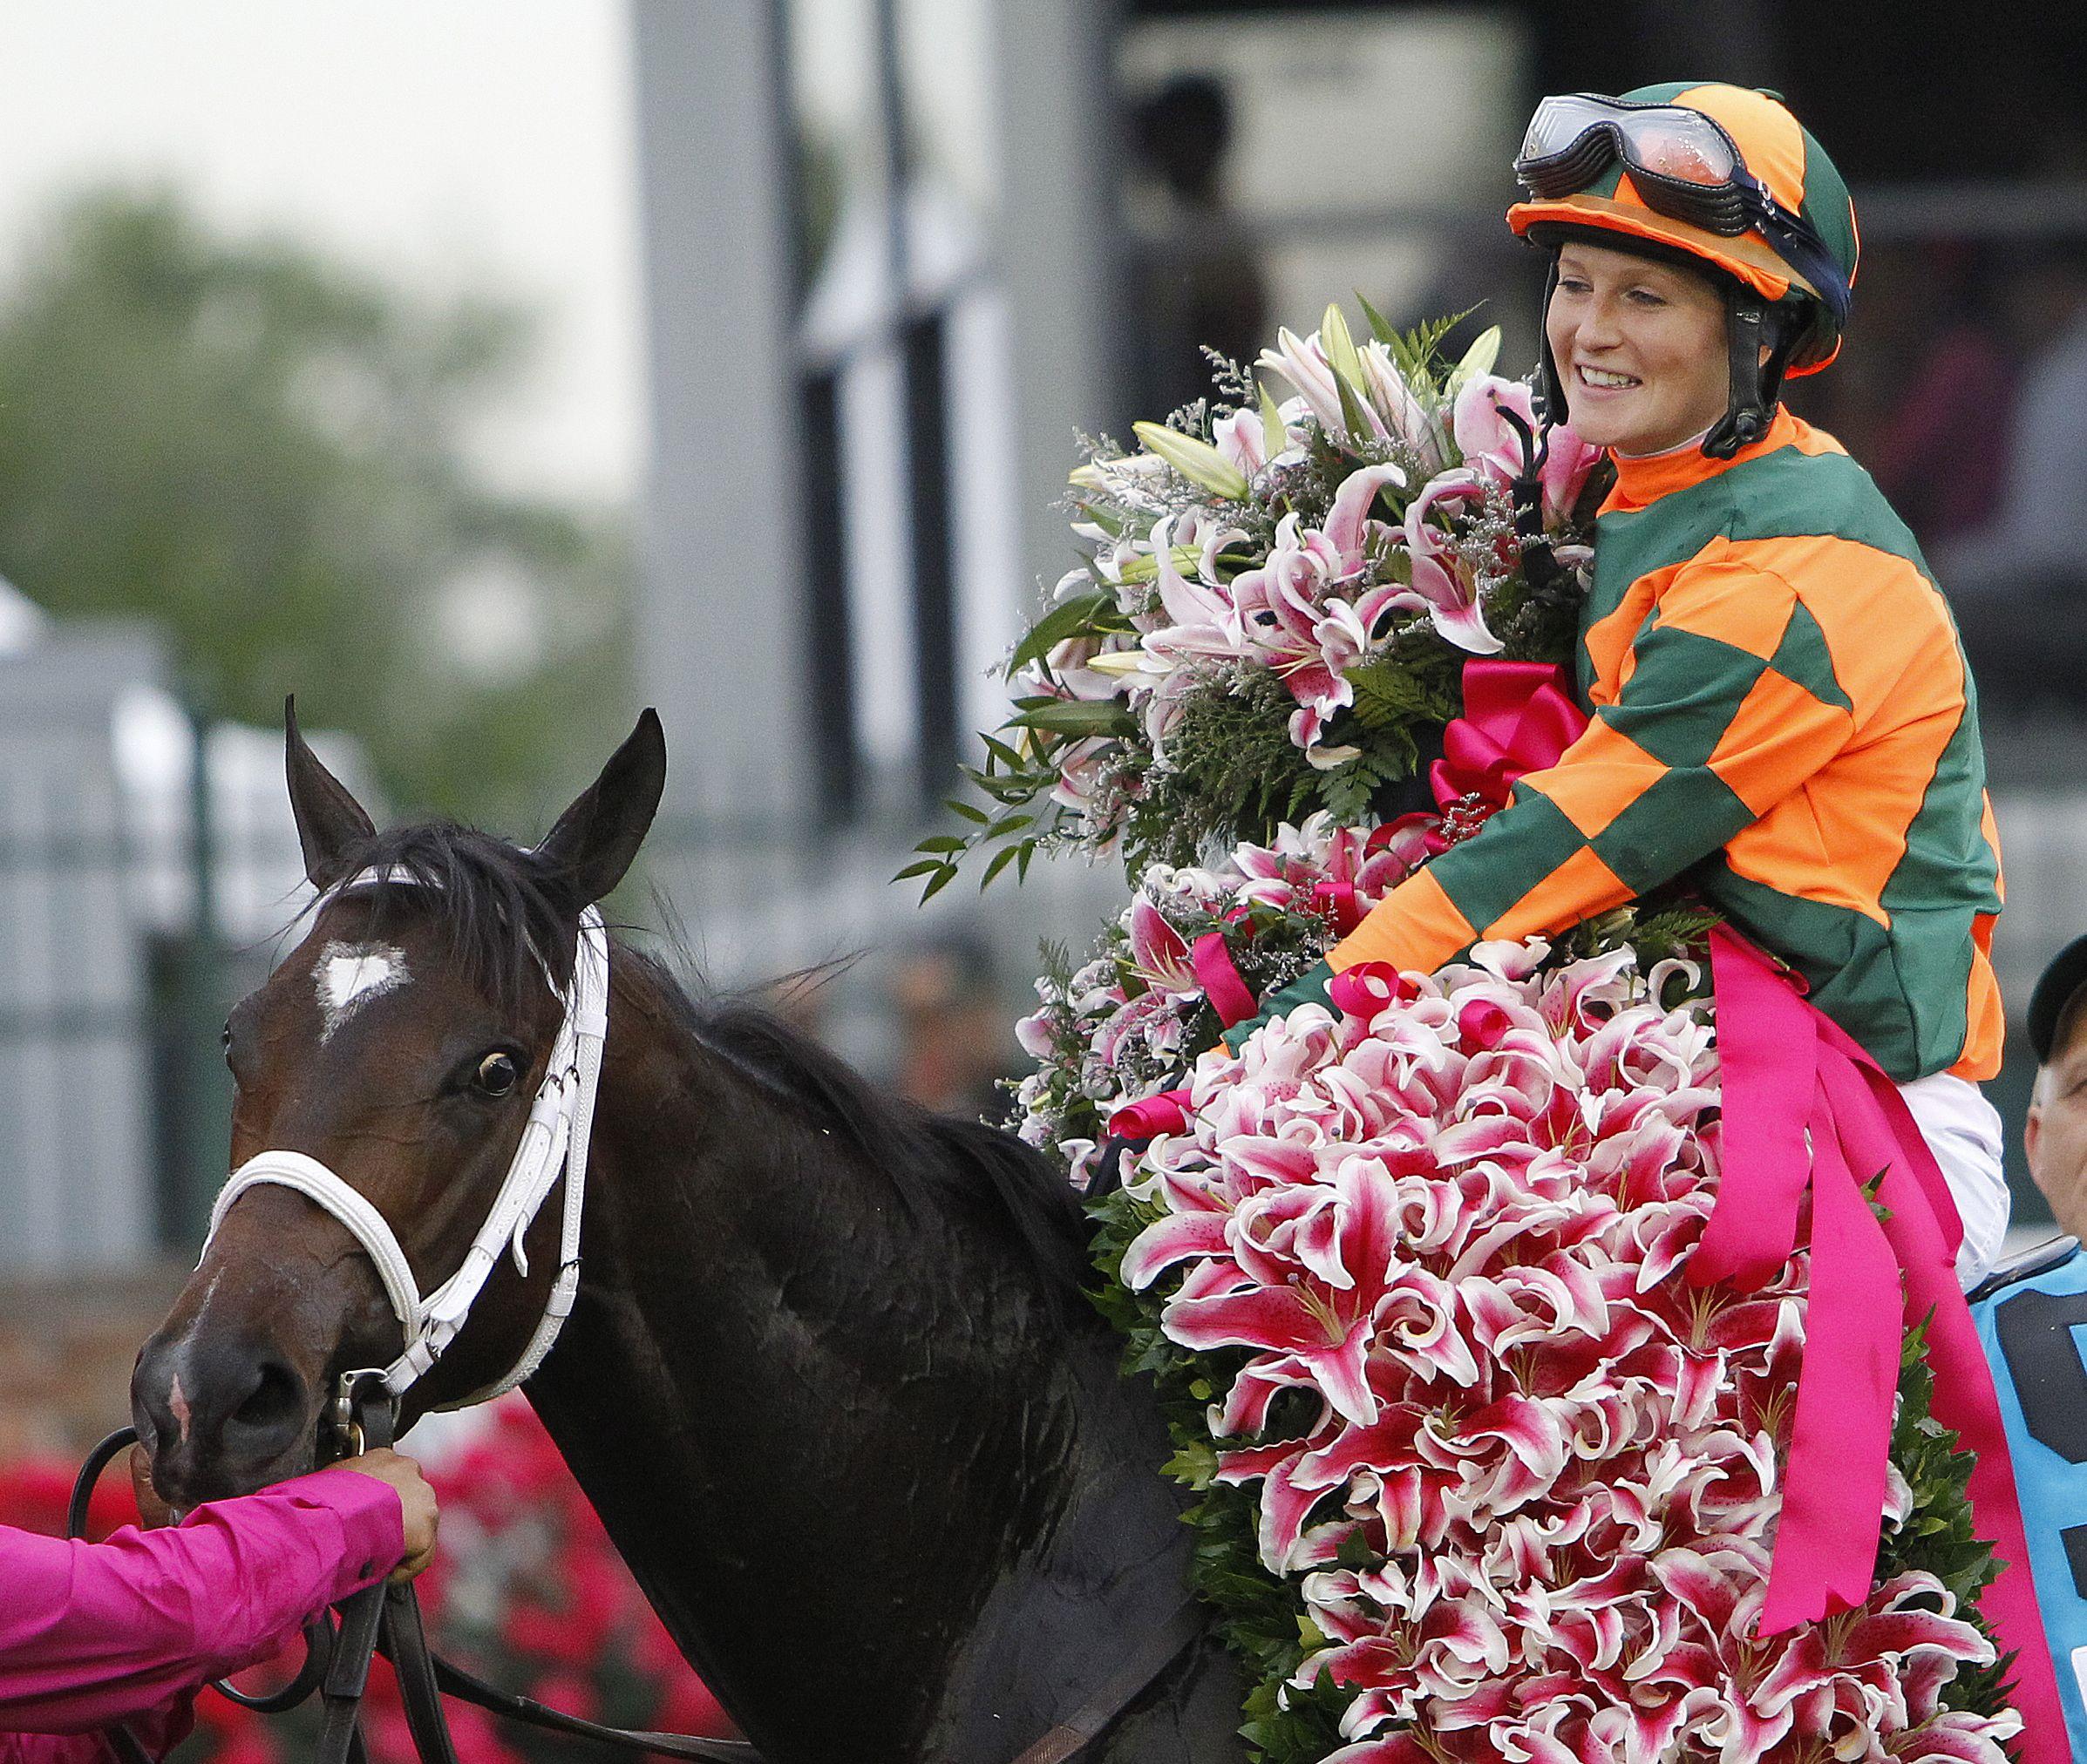 Jockey Rosie Napravnik Became The First Female Jockey To